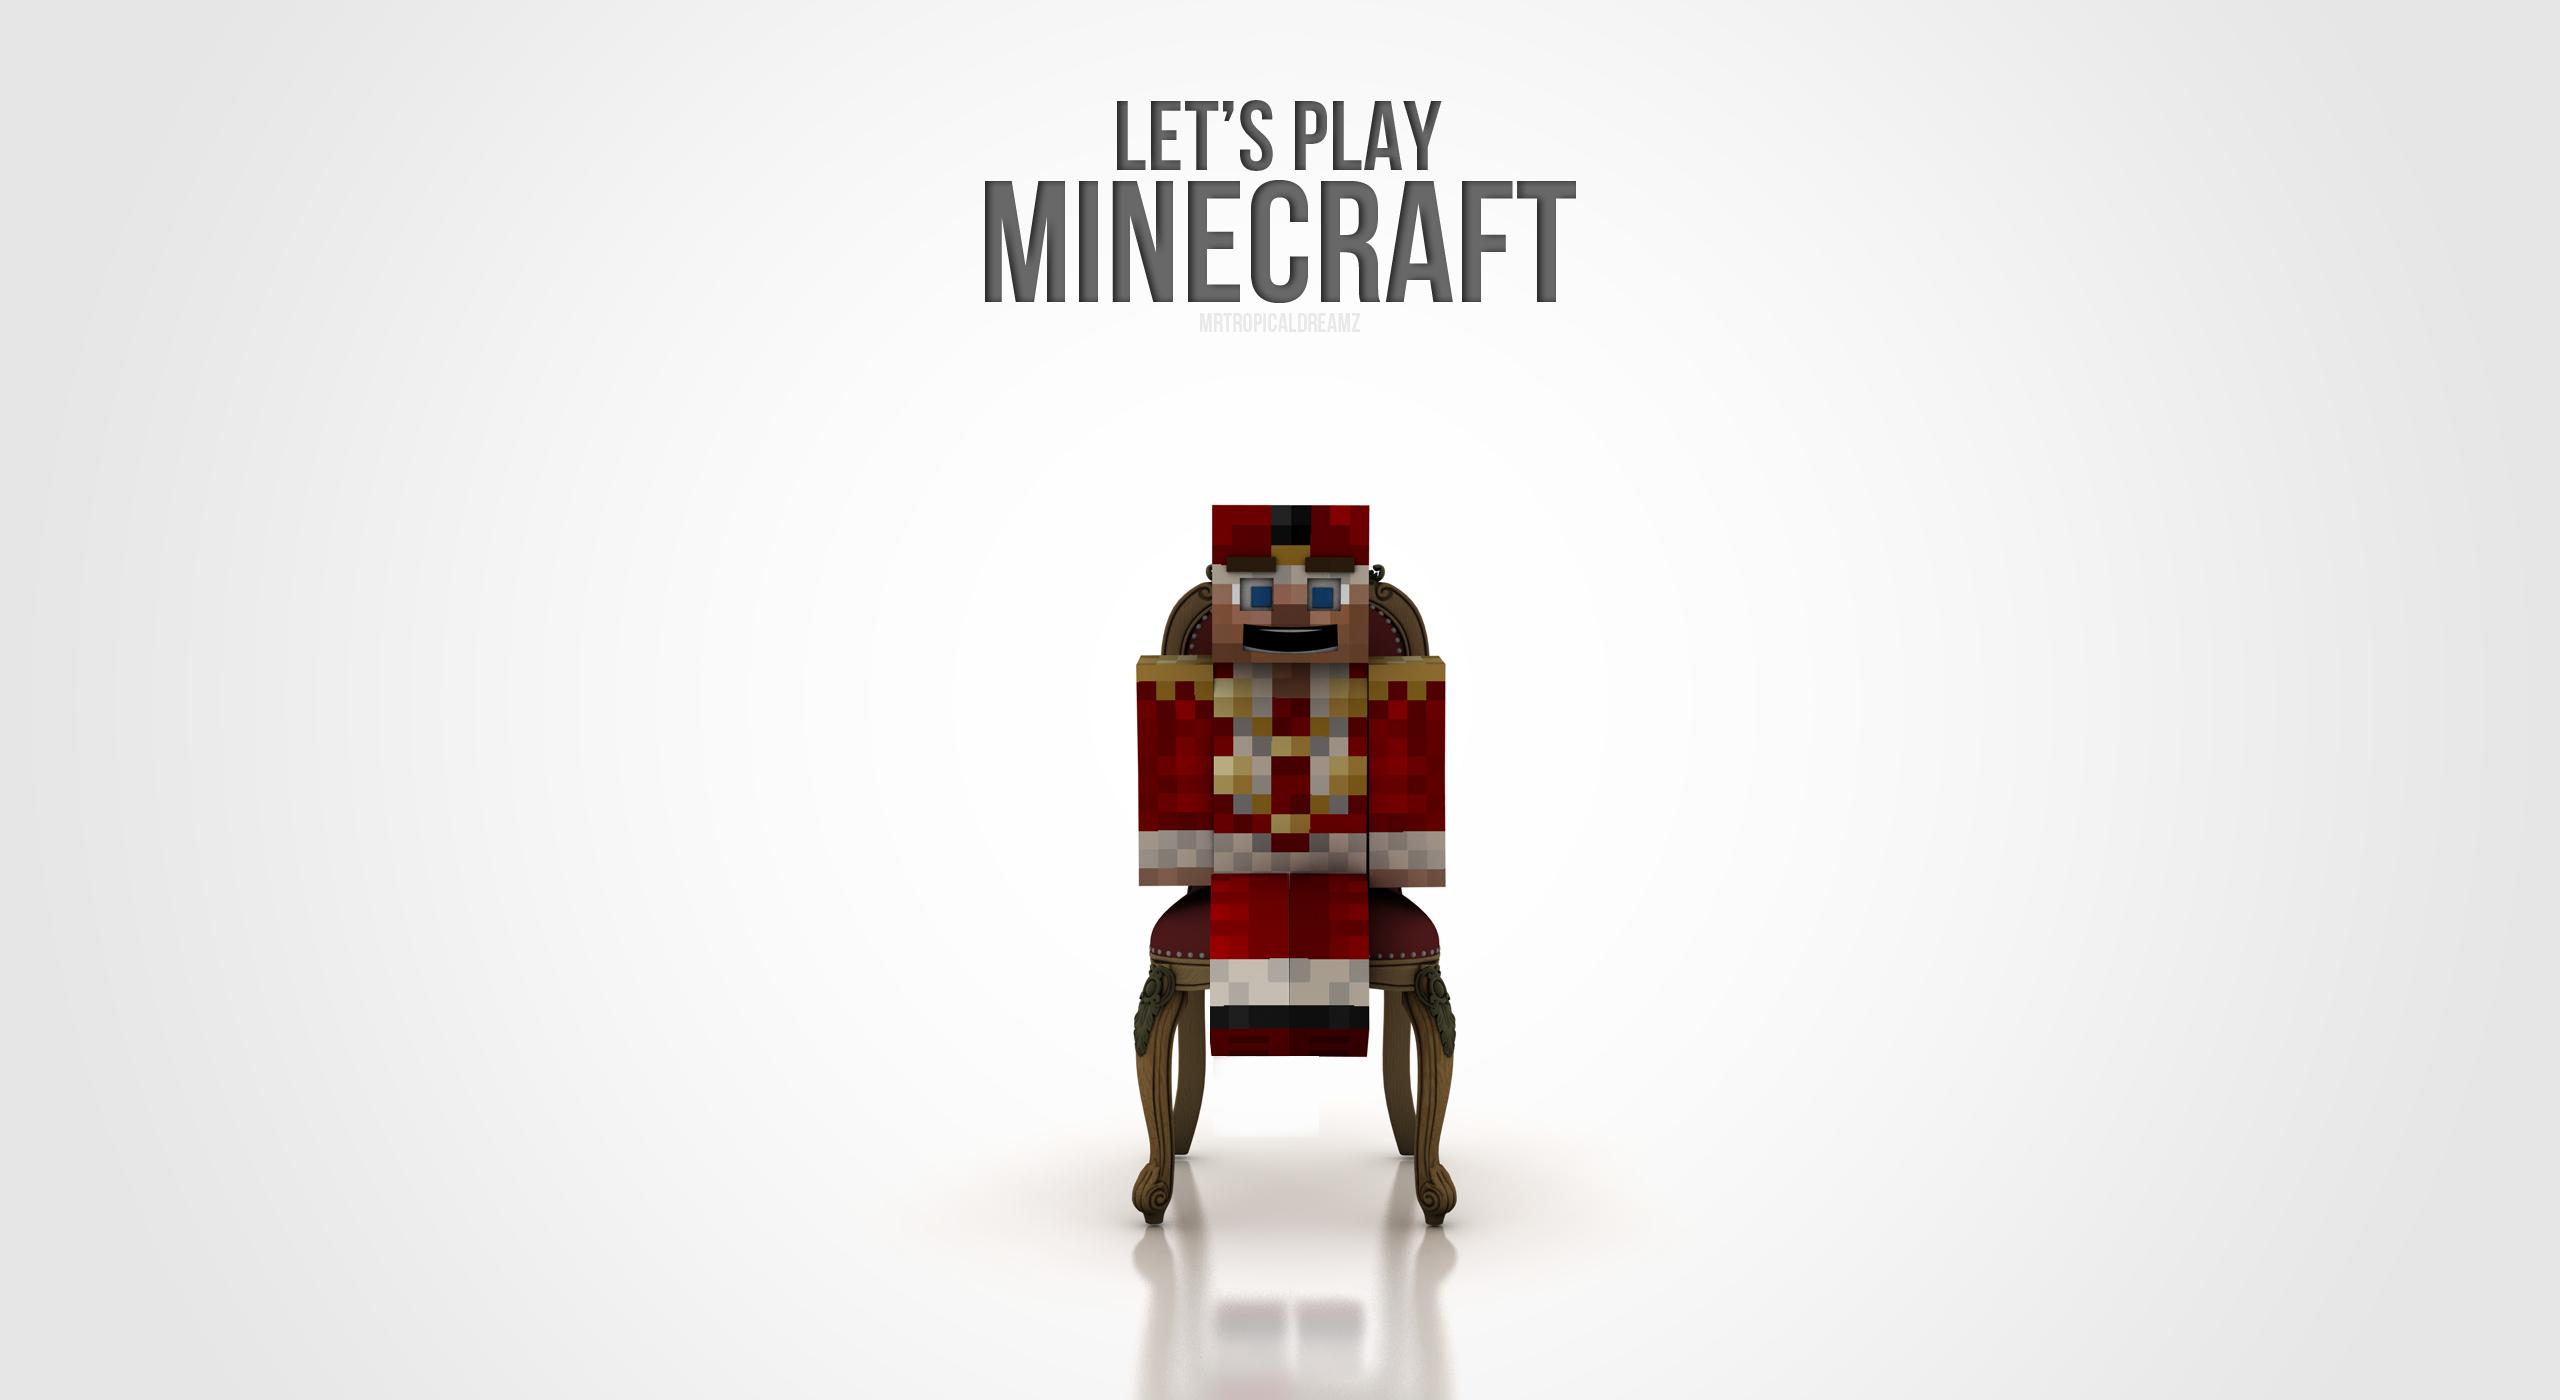 Minecraft Simple 3d Wallpaper By Killaoptik On Deviantart